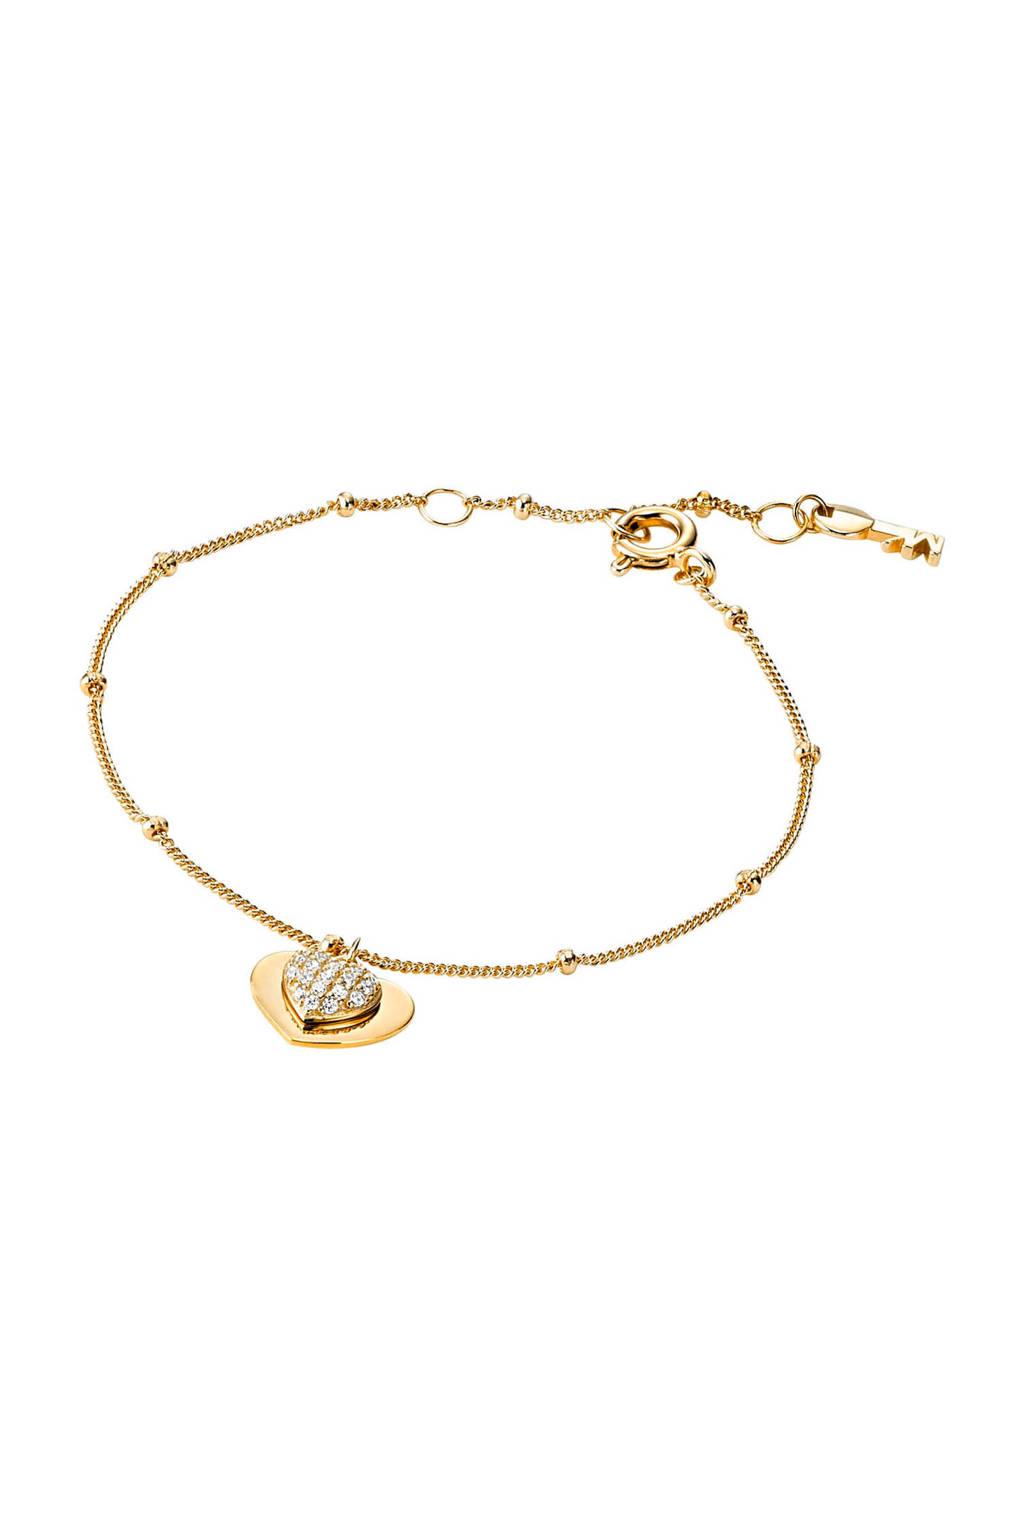 Michael Kors zilveren armband Love goudkleurig - MKC1118AN710, Goud